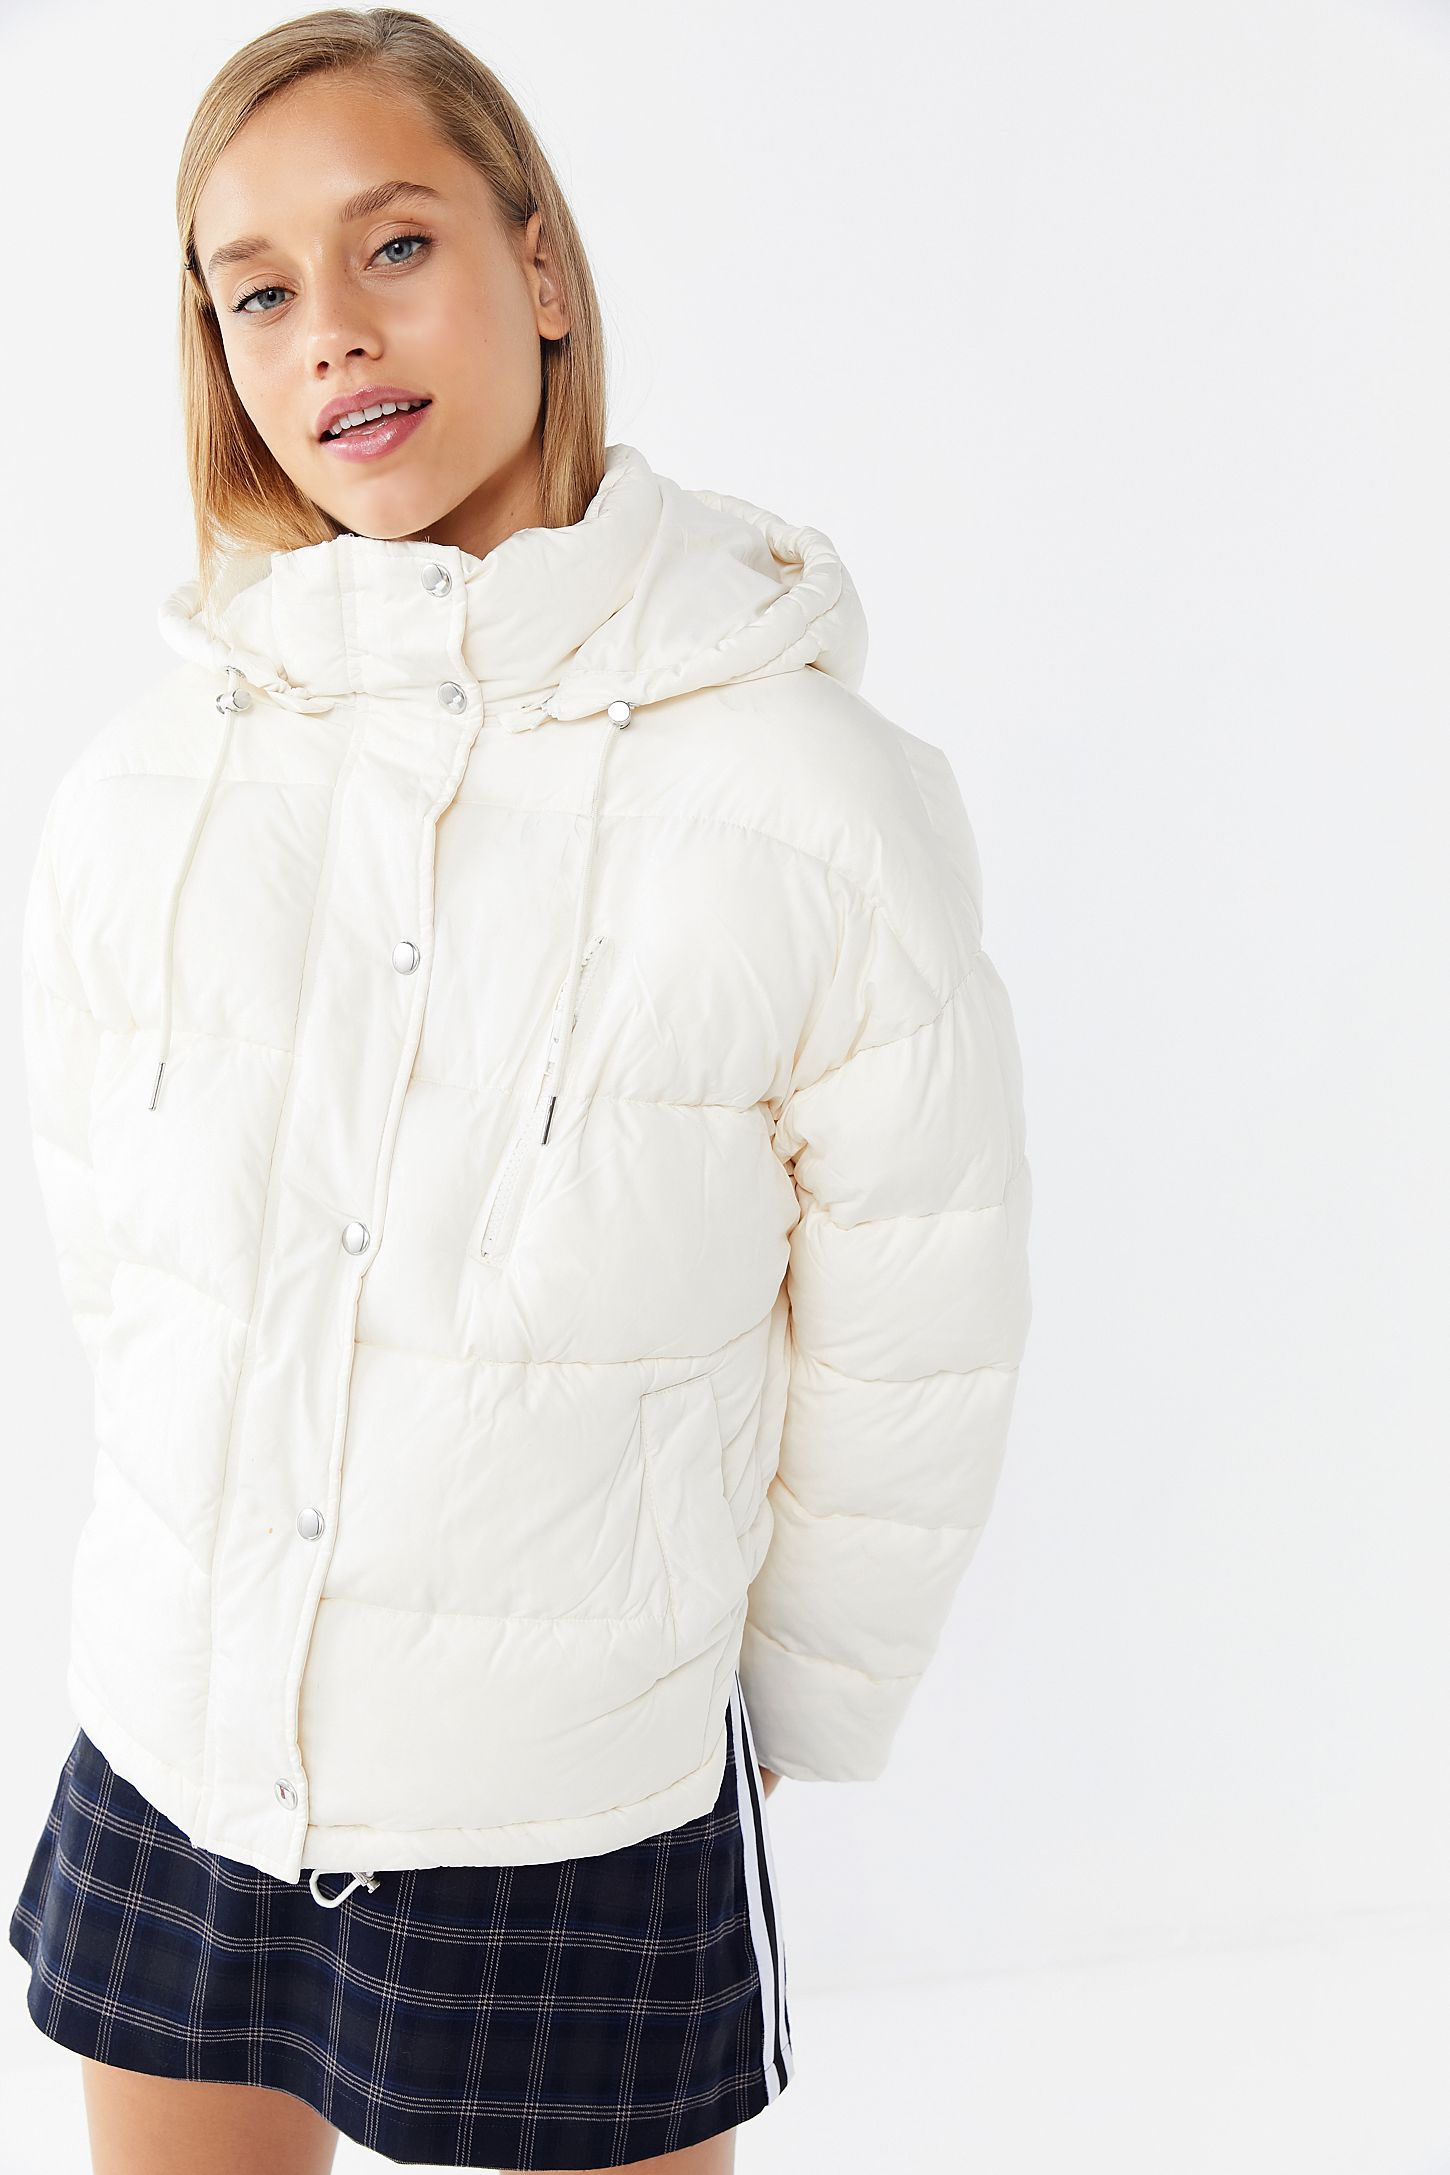 Uo Mae Hooded Puffer Jacket White Puffer Jacket Jackets Puffer Jackets [ 2175 x 1450 Pixel ]